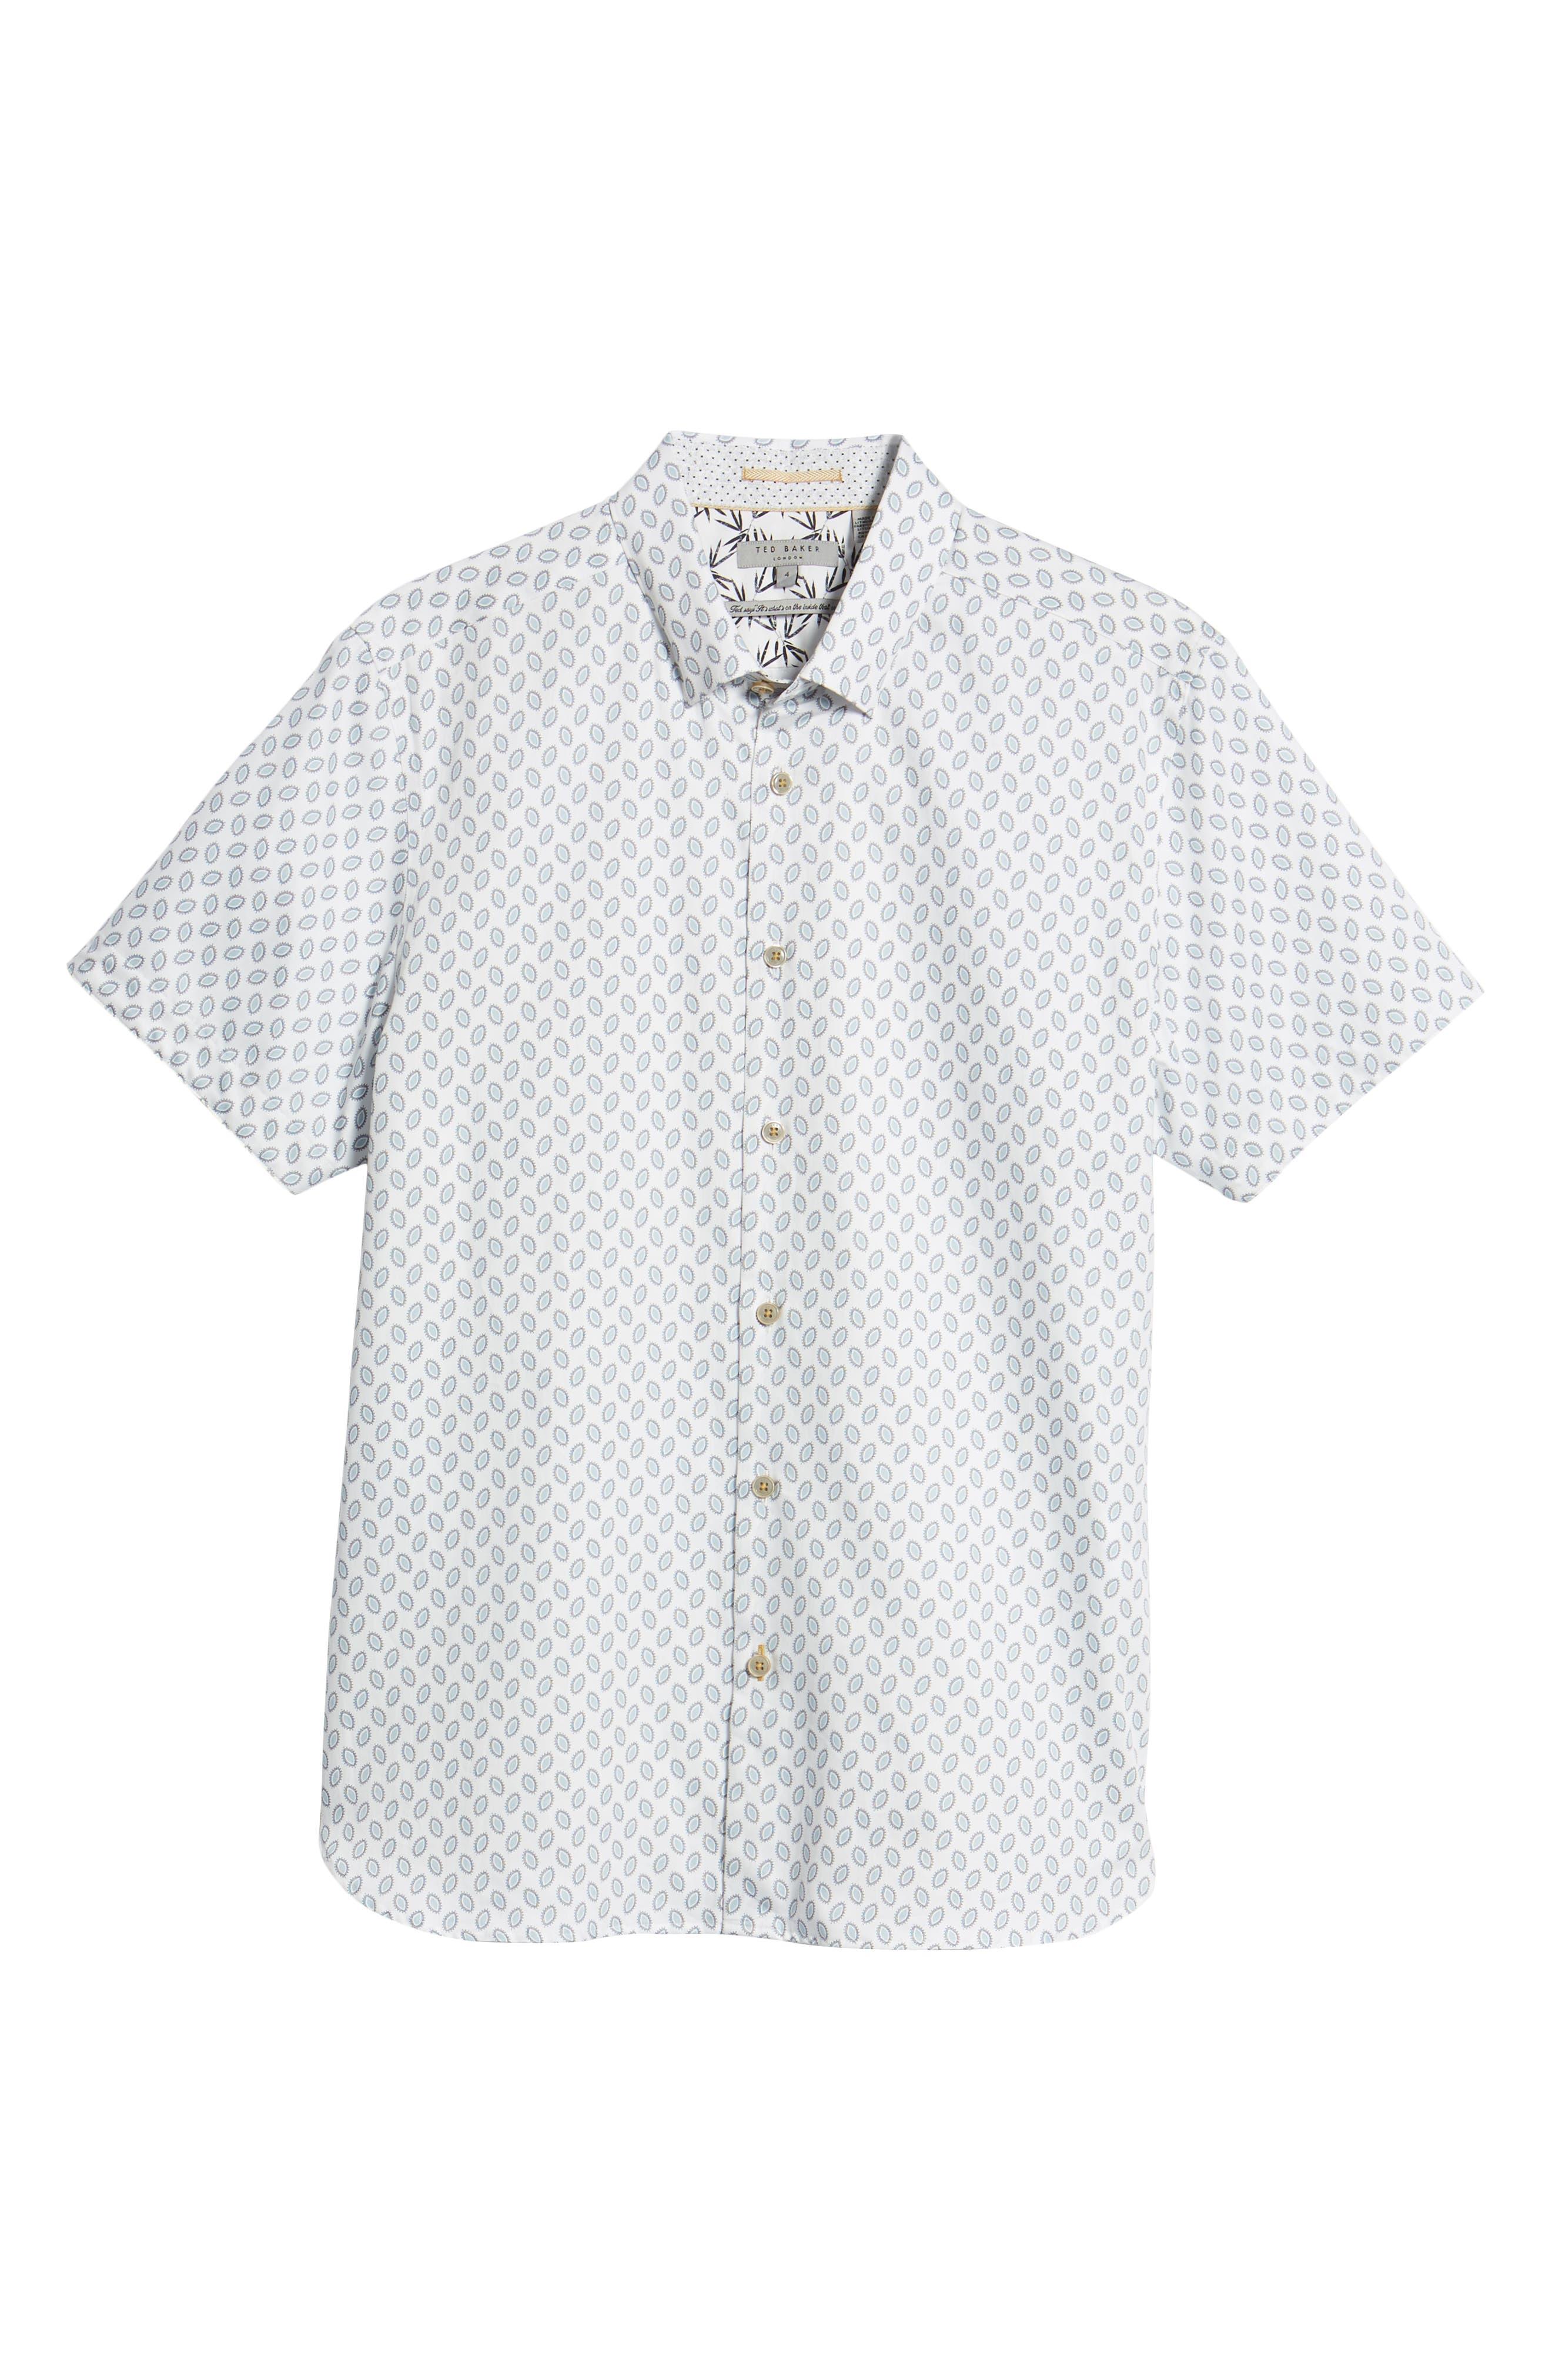 Newfone Trim Fit Chambray Sport Shirt,                             Alternate thumbnail 6, color,                             White